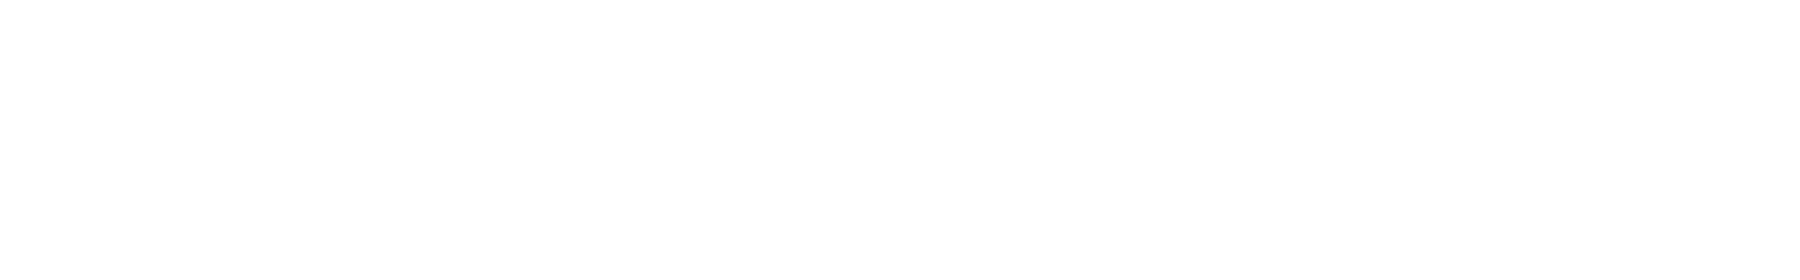 efectos fx 125